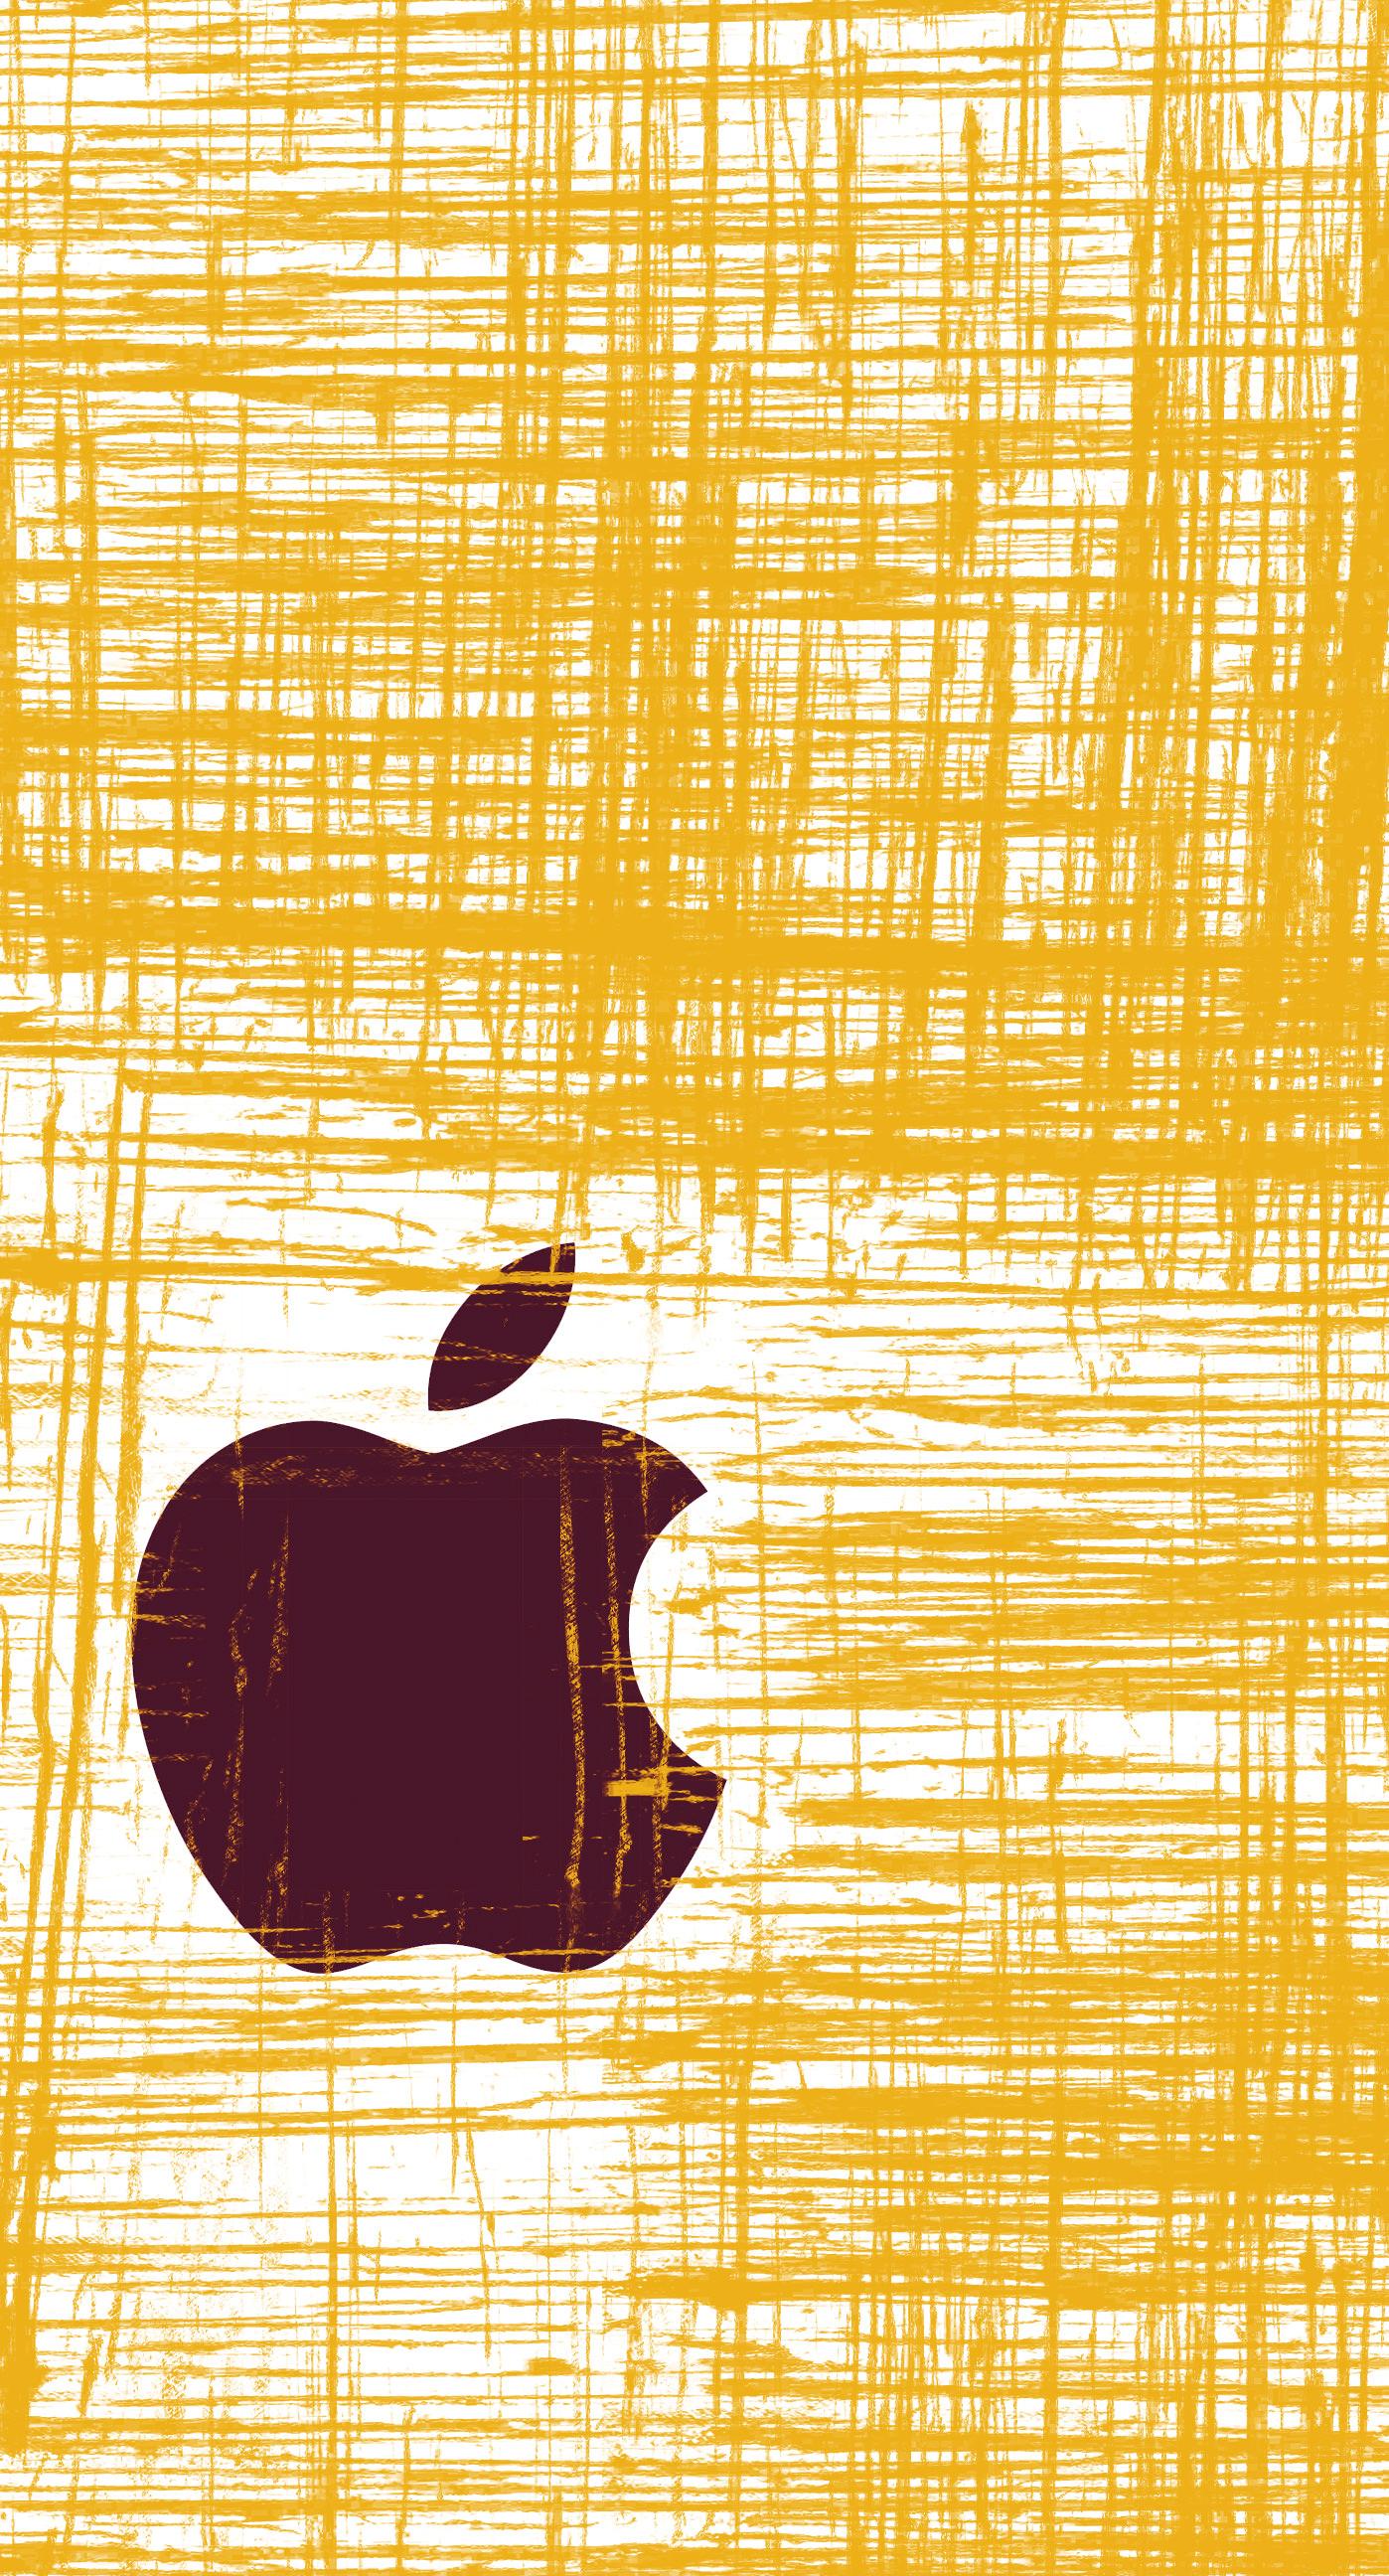 300 Wallpaper Iphone Warna Kuning HD